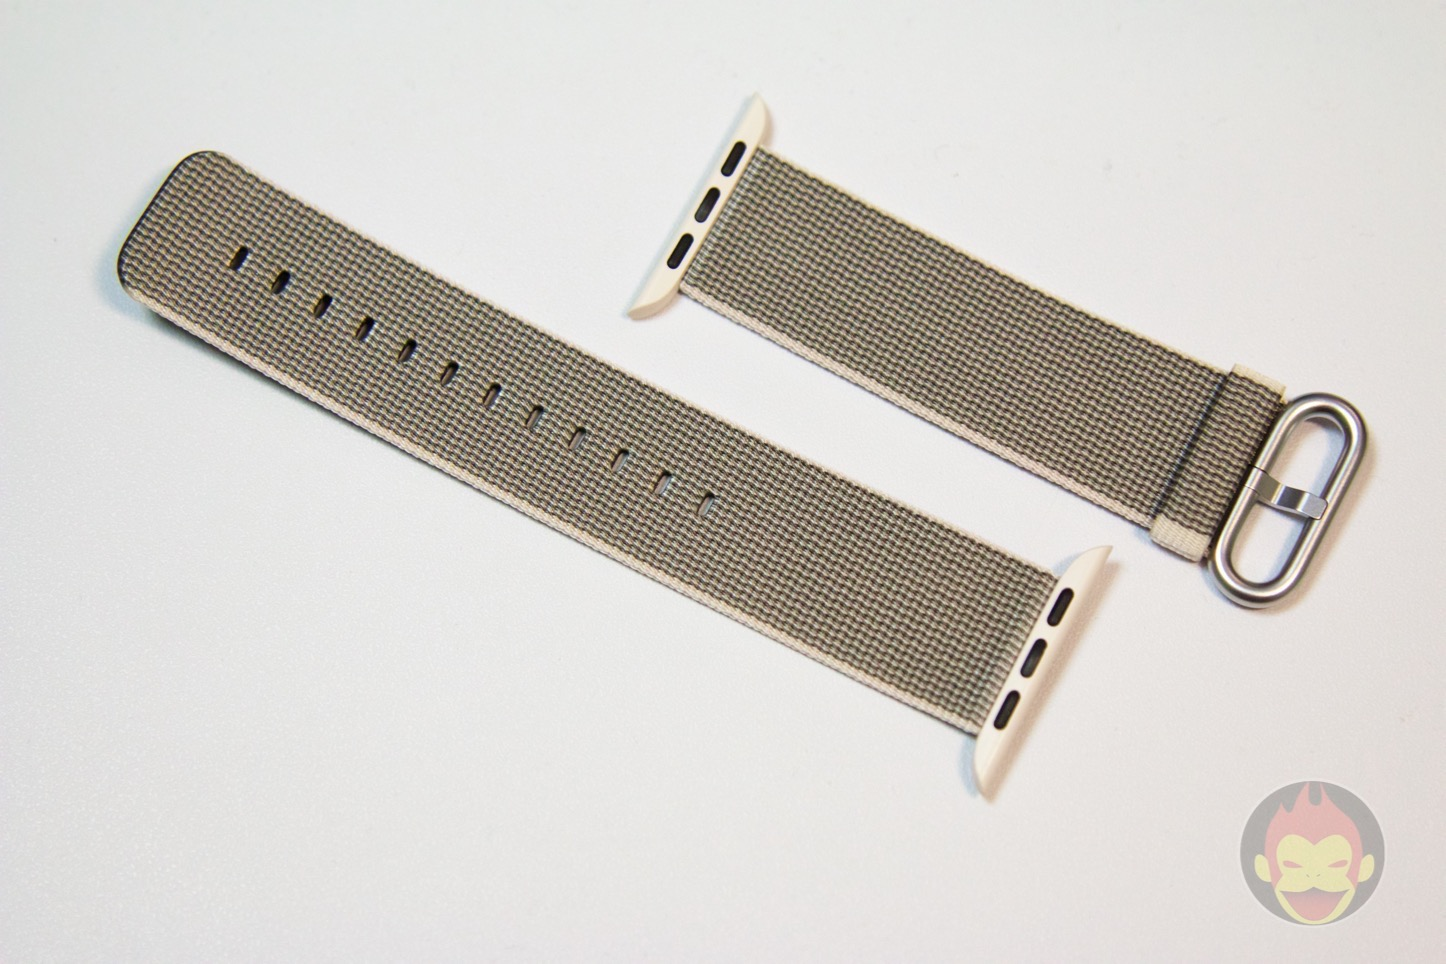 Apple-Watch-Woven-Nylon-Band-04.jpg